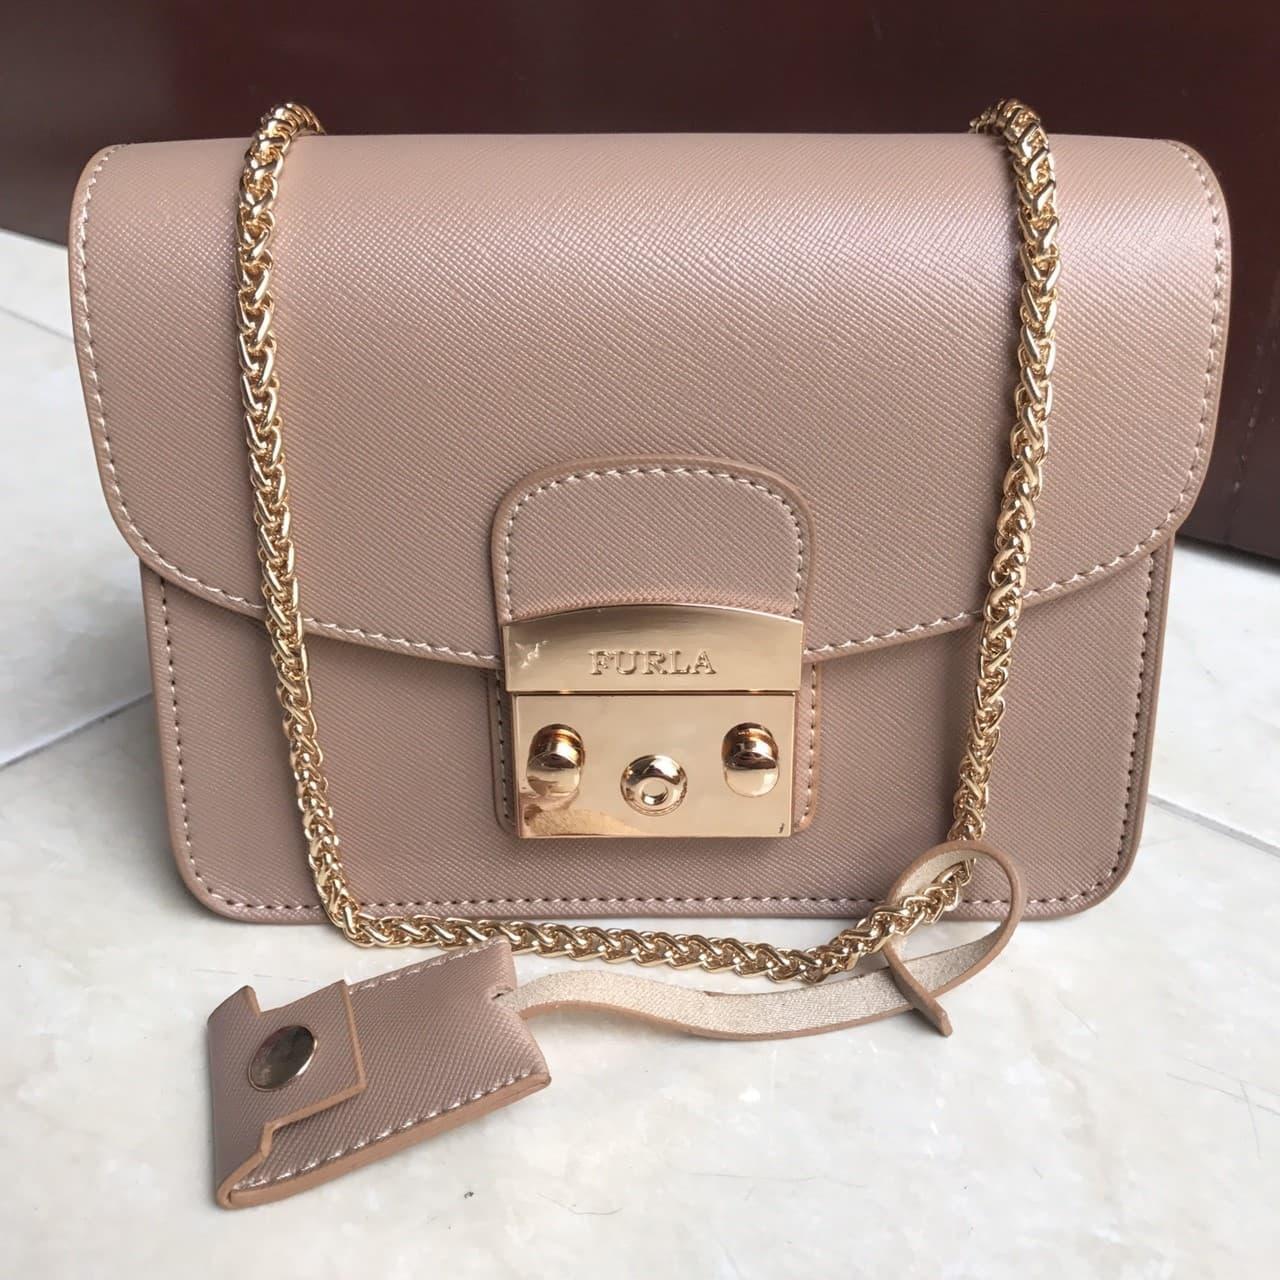 BEST SELLER Tas wanita cewe supplier branded murah import batam FURLA  METROPOLIS - Merah Muda 4fe615ddb4